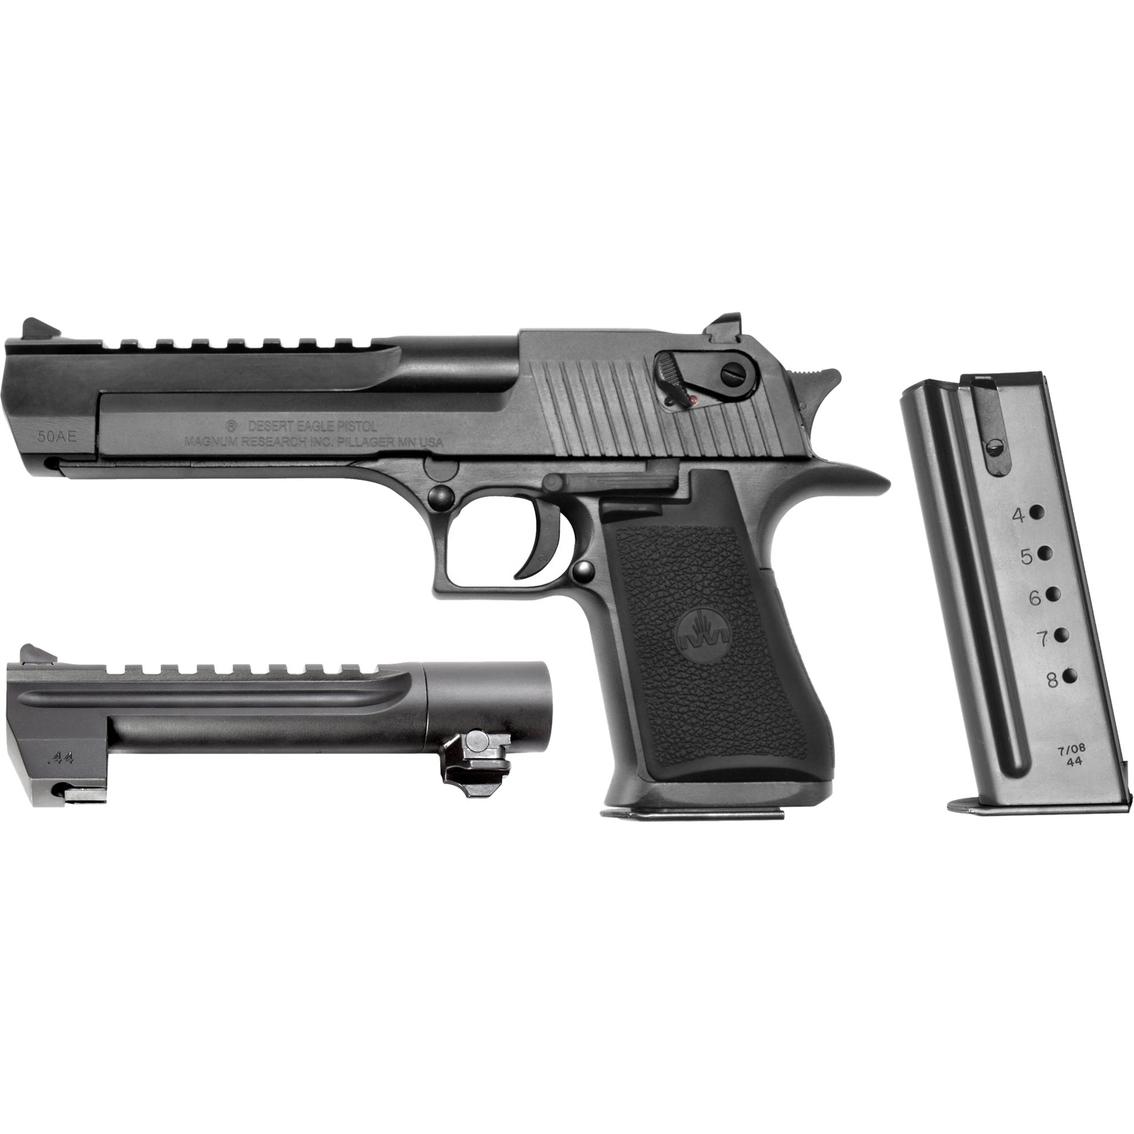 Pin em rubber band guns   1134x1134